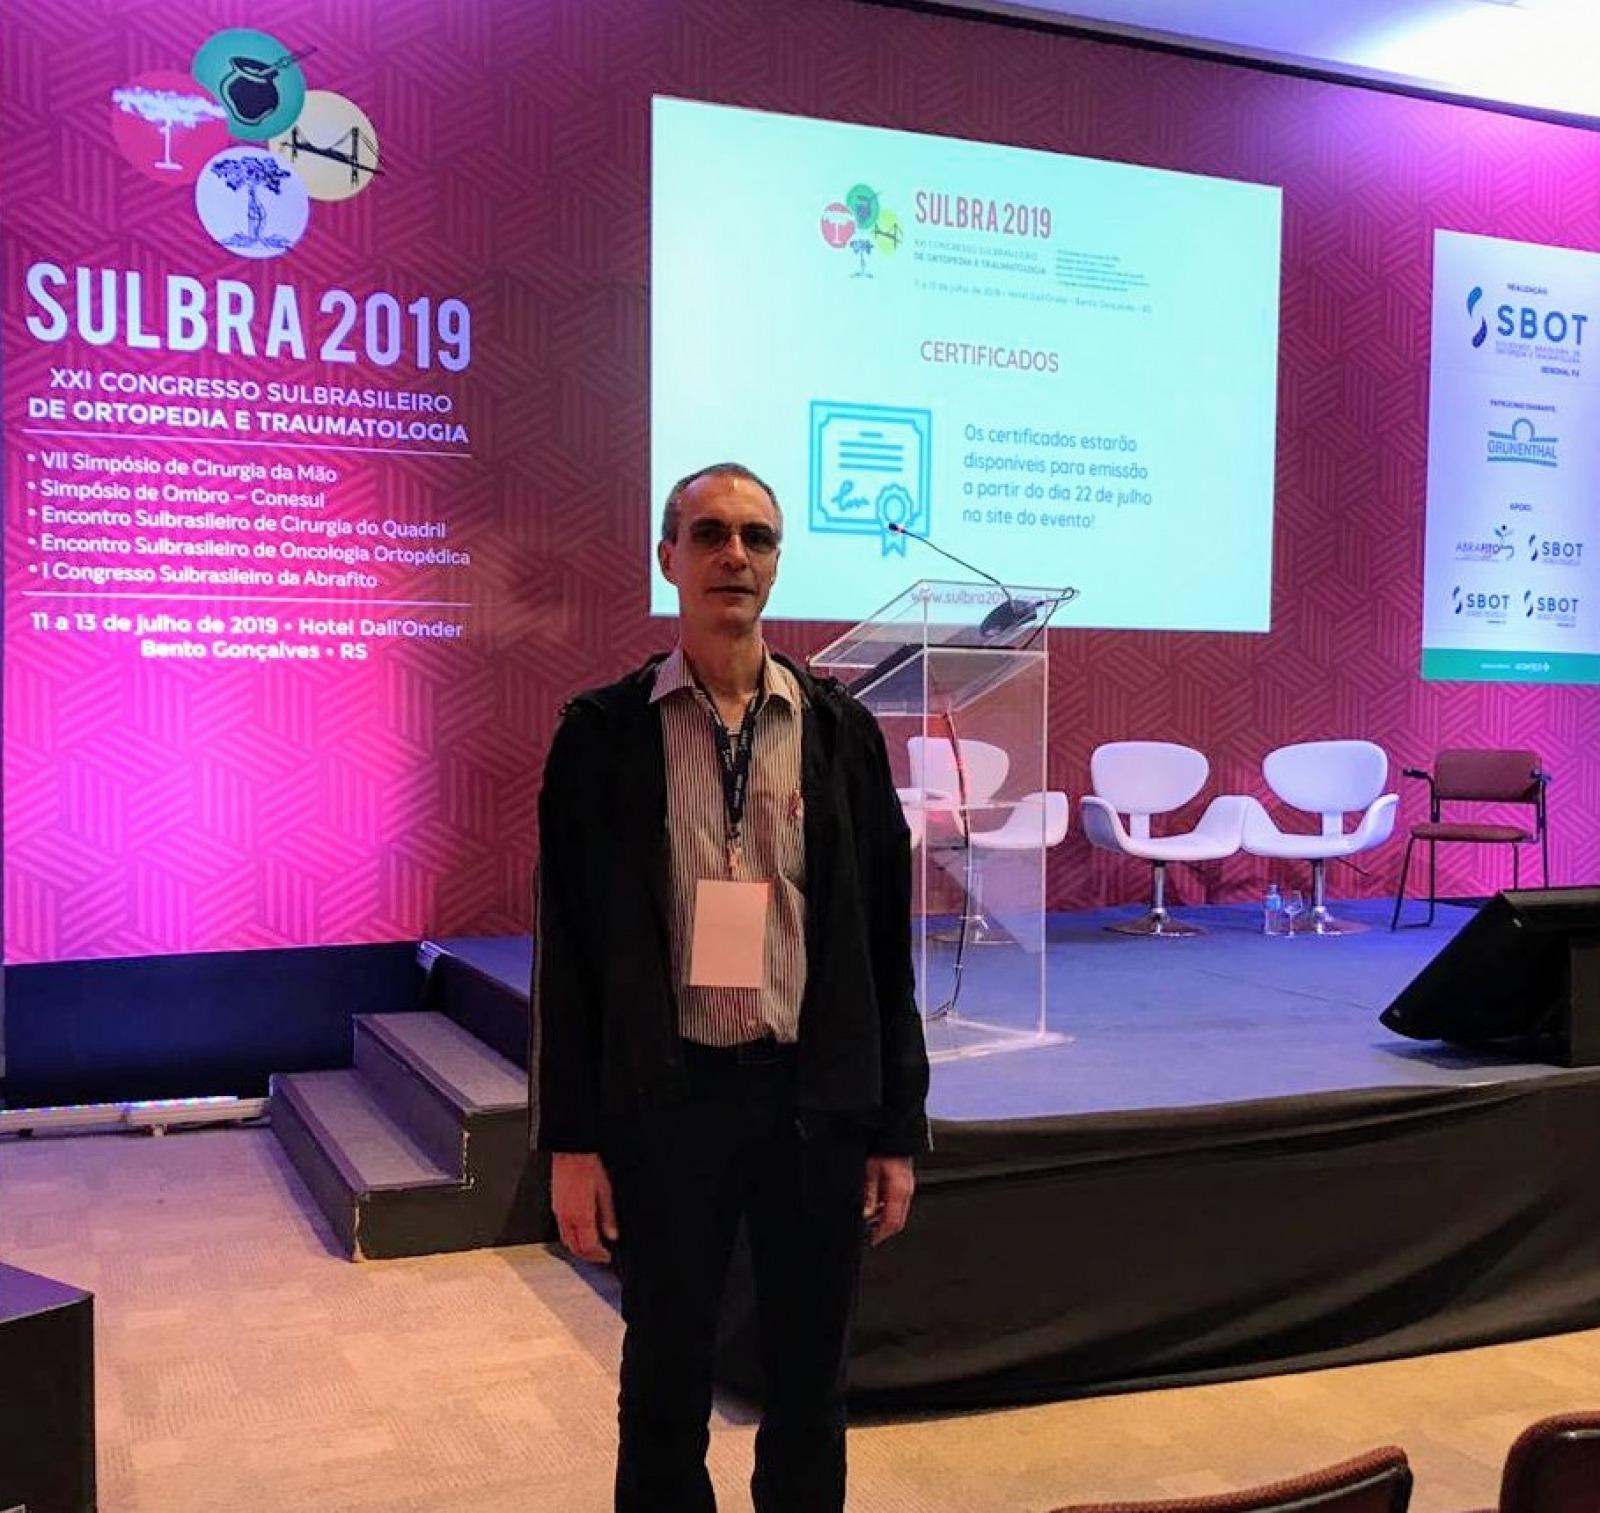 SULBRA 2019 – XXI Congresso Sulbrasileiro de Ortopedia e Traumatologia